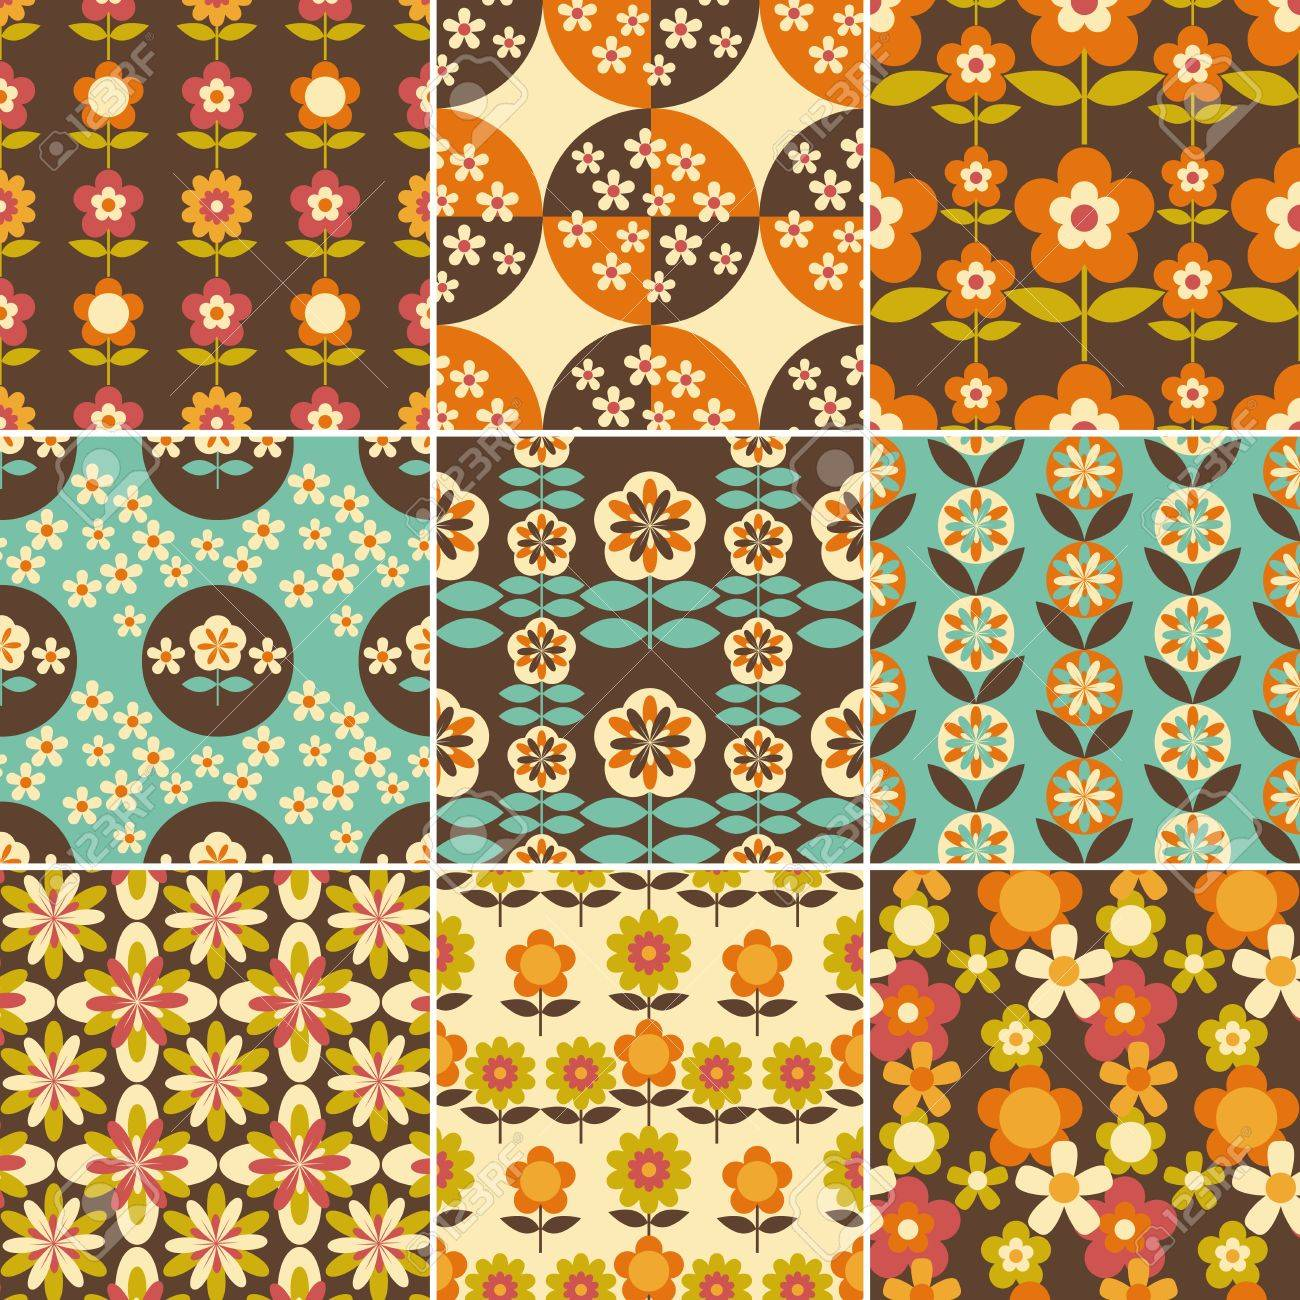 20er Set Seamless Patterns Design Wallpaper Lizenzfrei Nutzbare ...